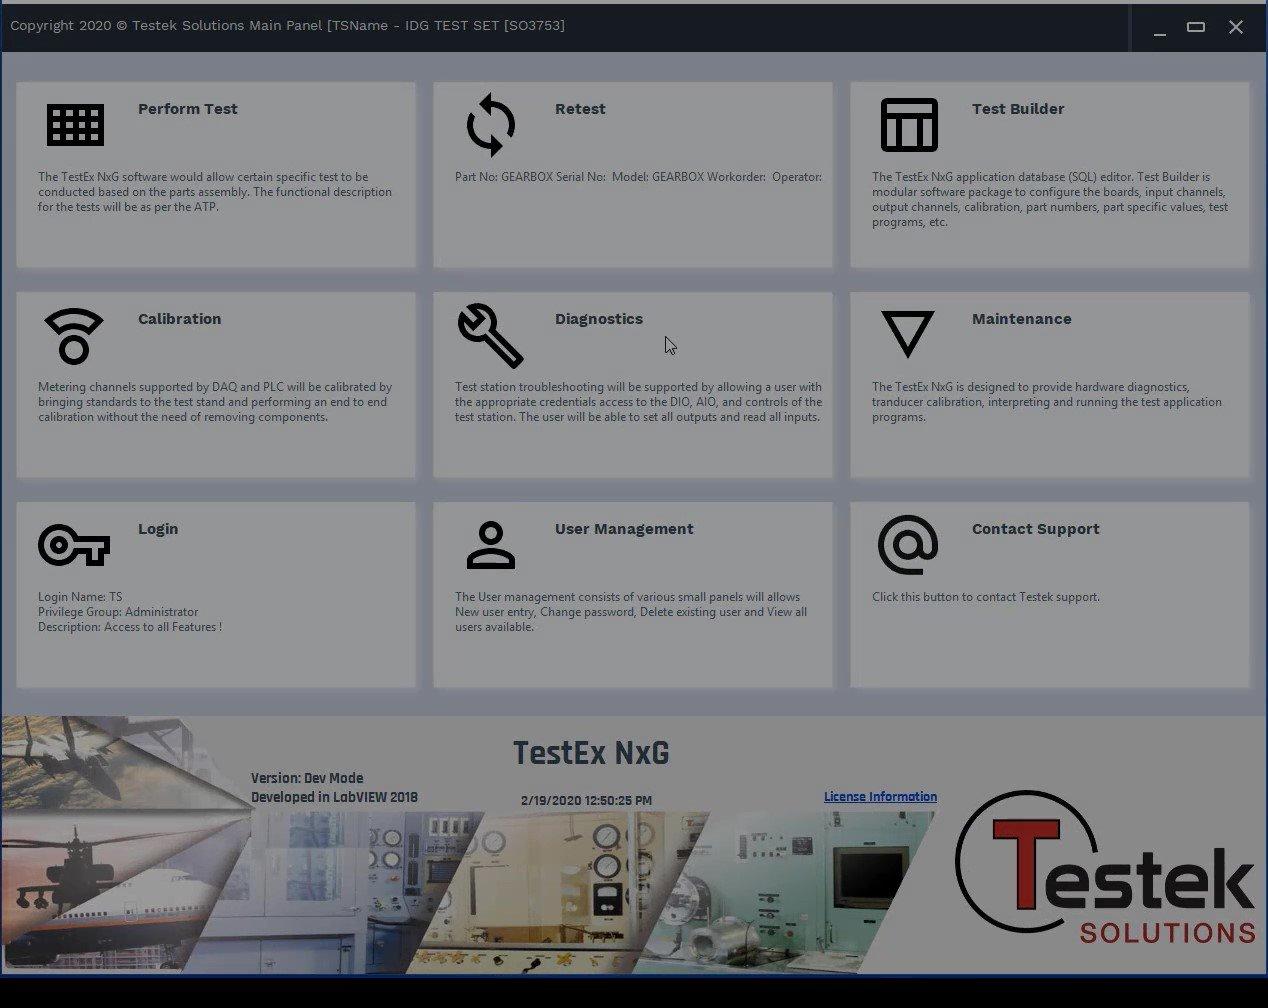 TestEx NxG Main Panel